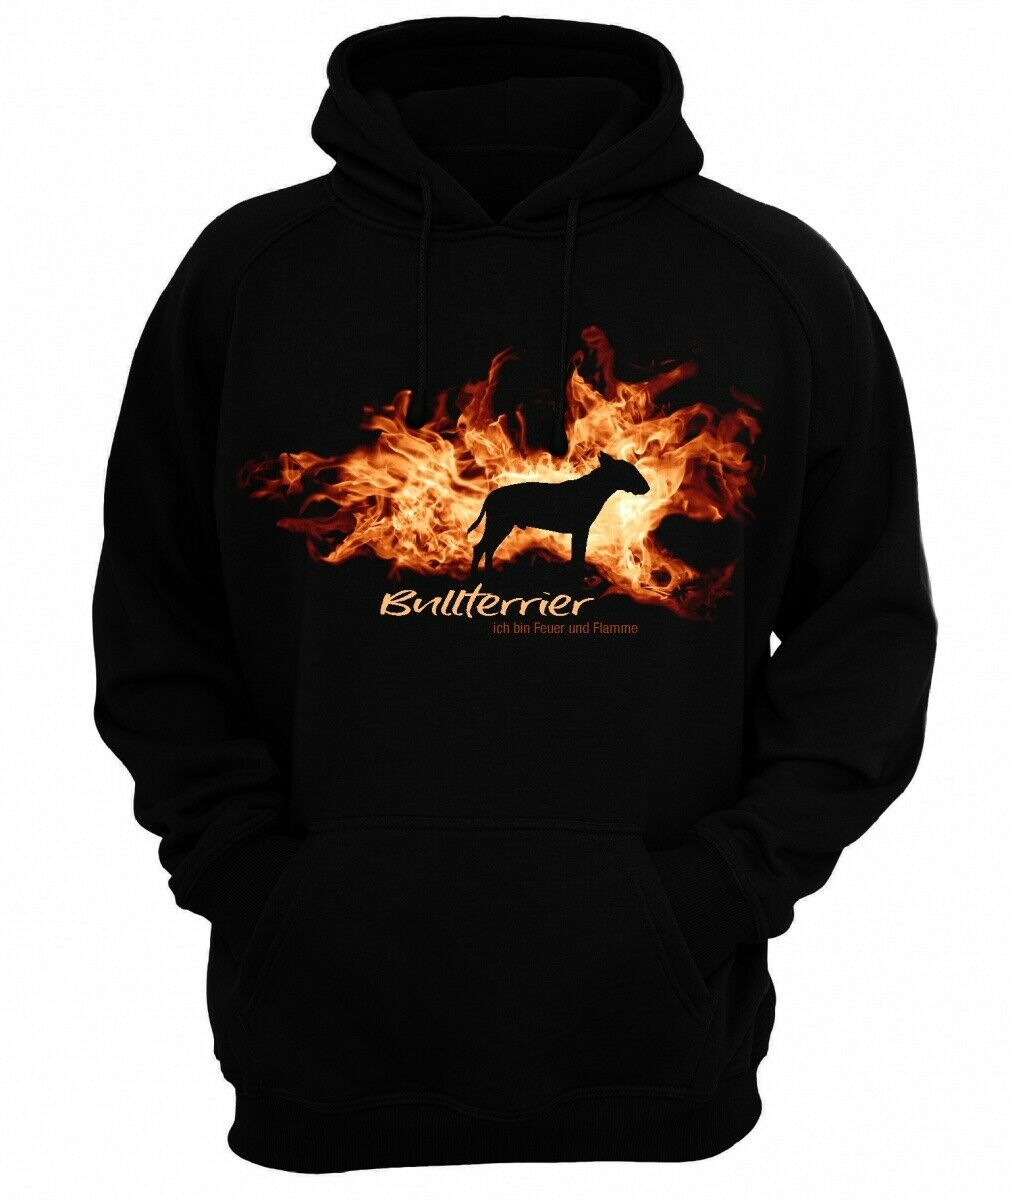 Sweatshirt BULLTERRIER FEUER UND FLAMME by Siviwonder Hoodie    Outlet    Smart    Sale Outlet